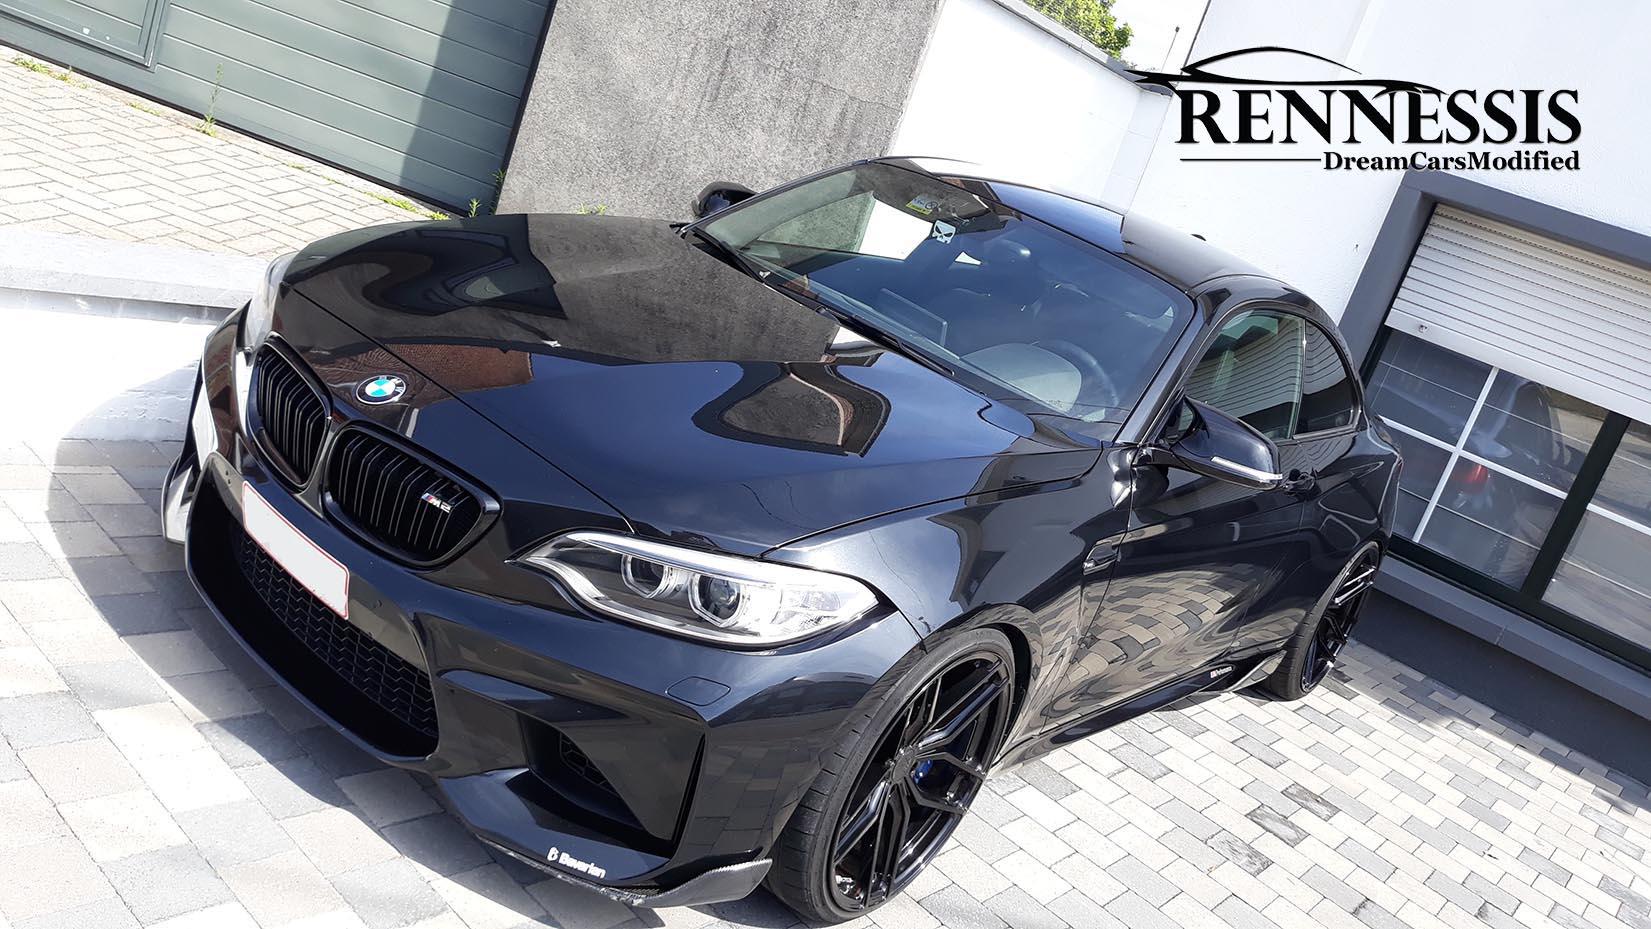 bmw-m-look-full-glossy-black-mirror-covers-units-for-f20-f22-f30-f32-installed-luk-belgium-4.jpg